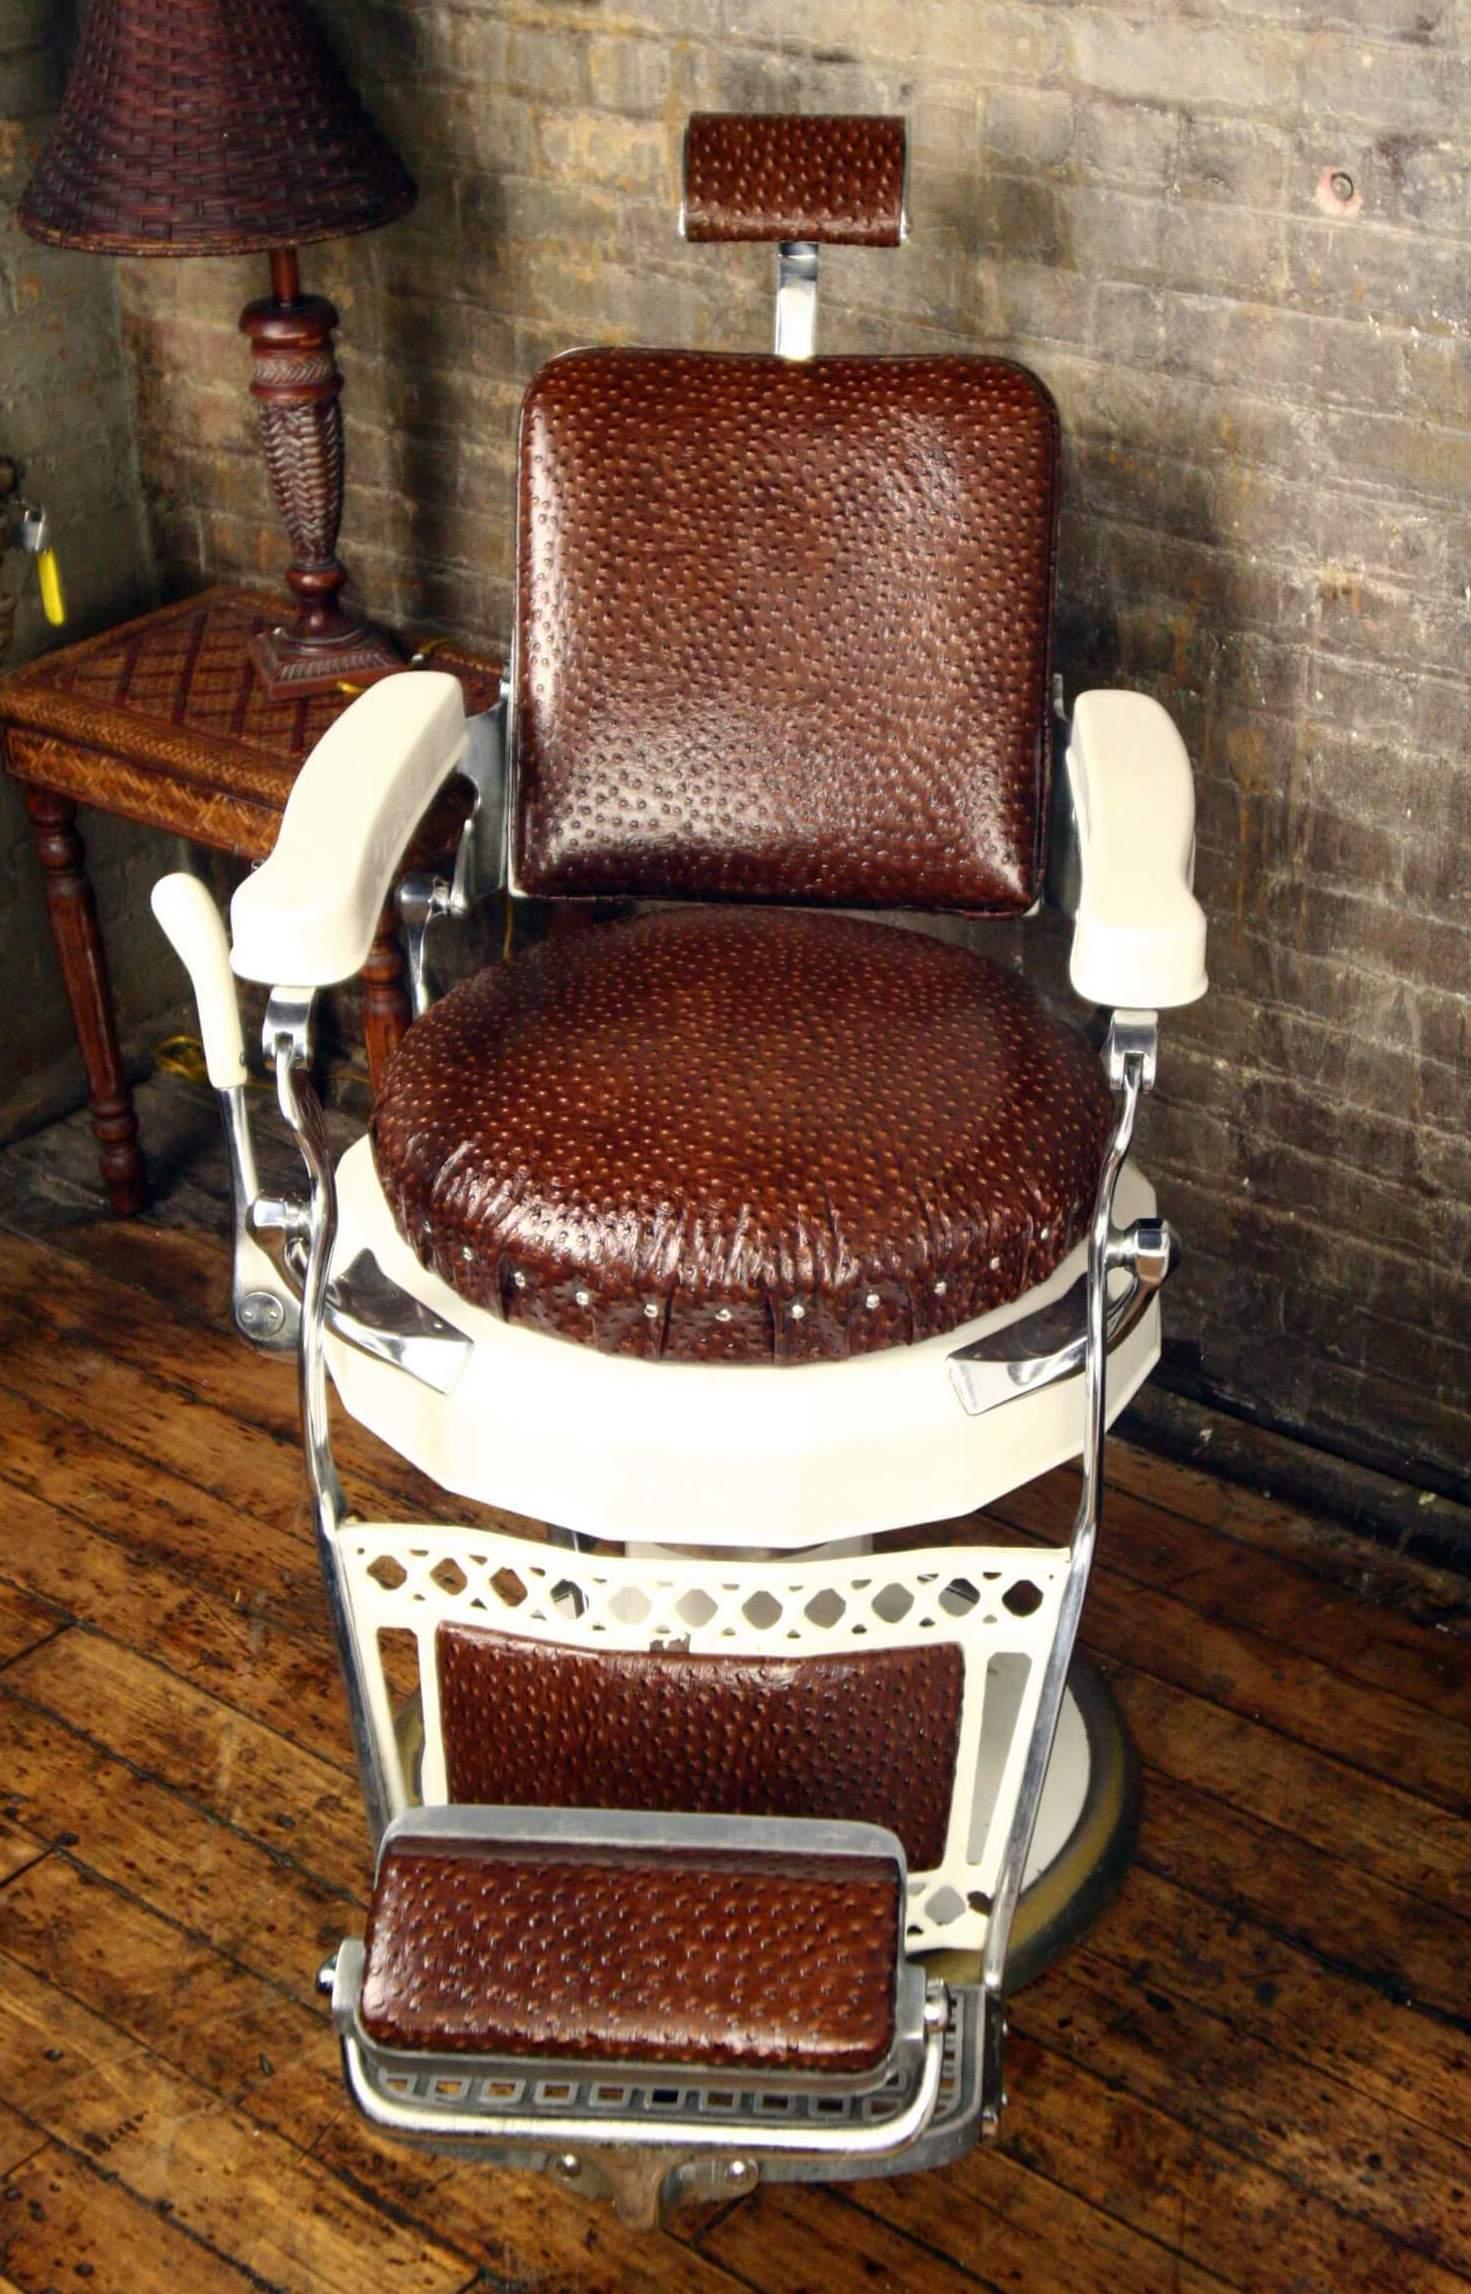 belmont barber chair repair minnie mouse recliner belvedere antique furniture